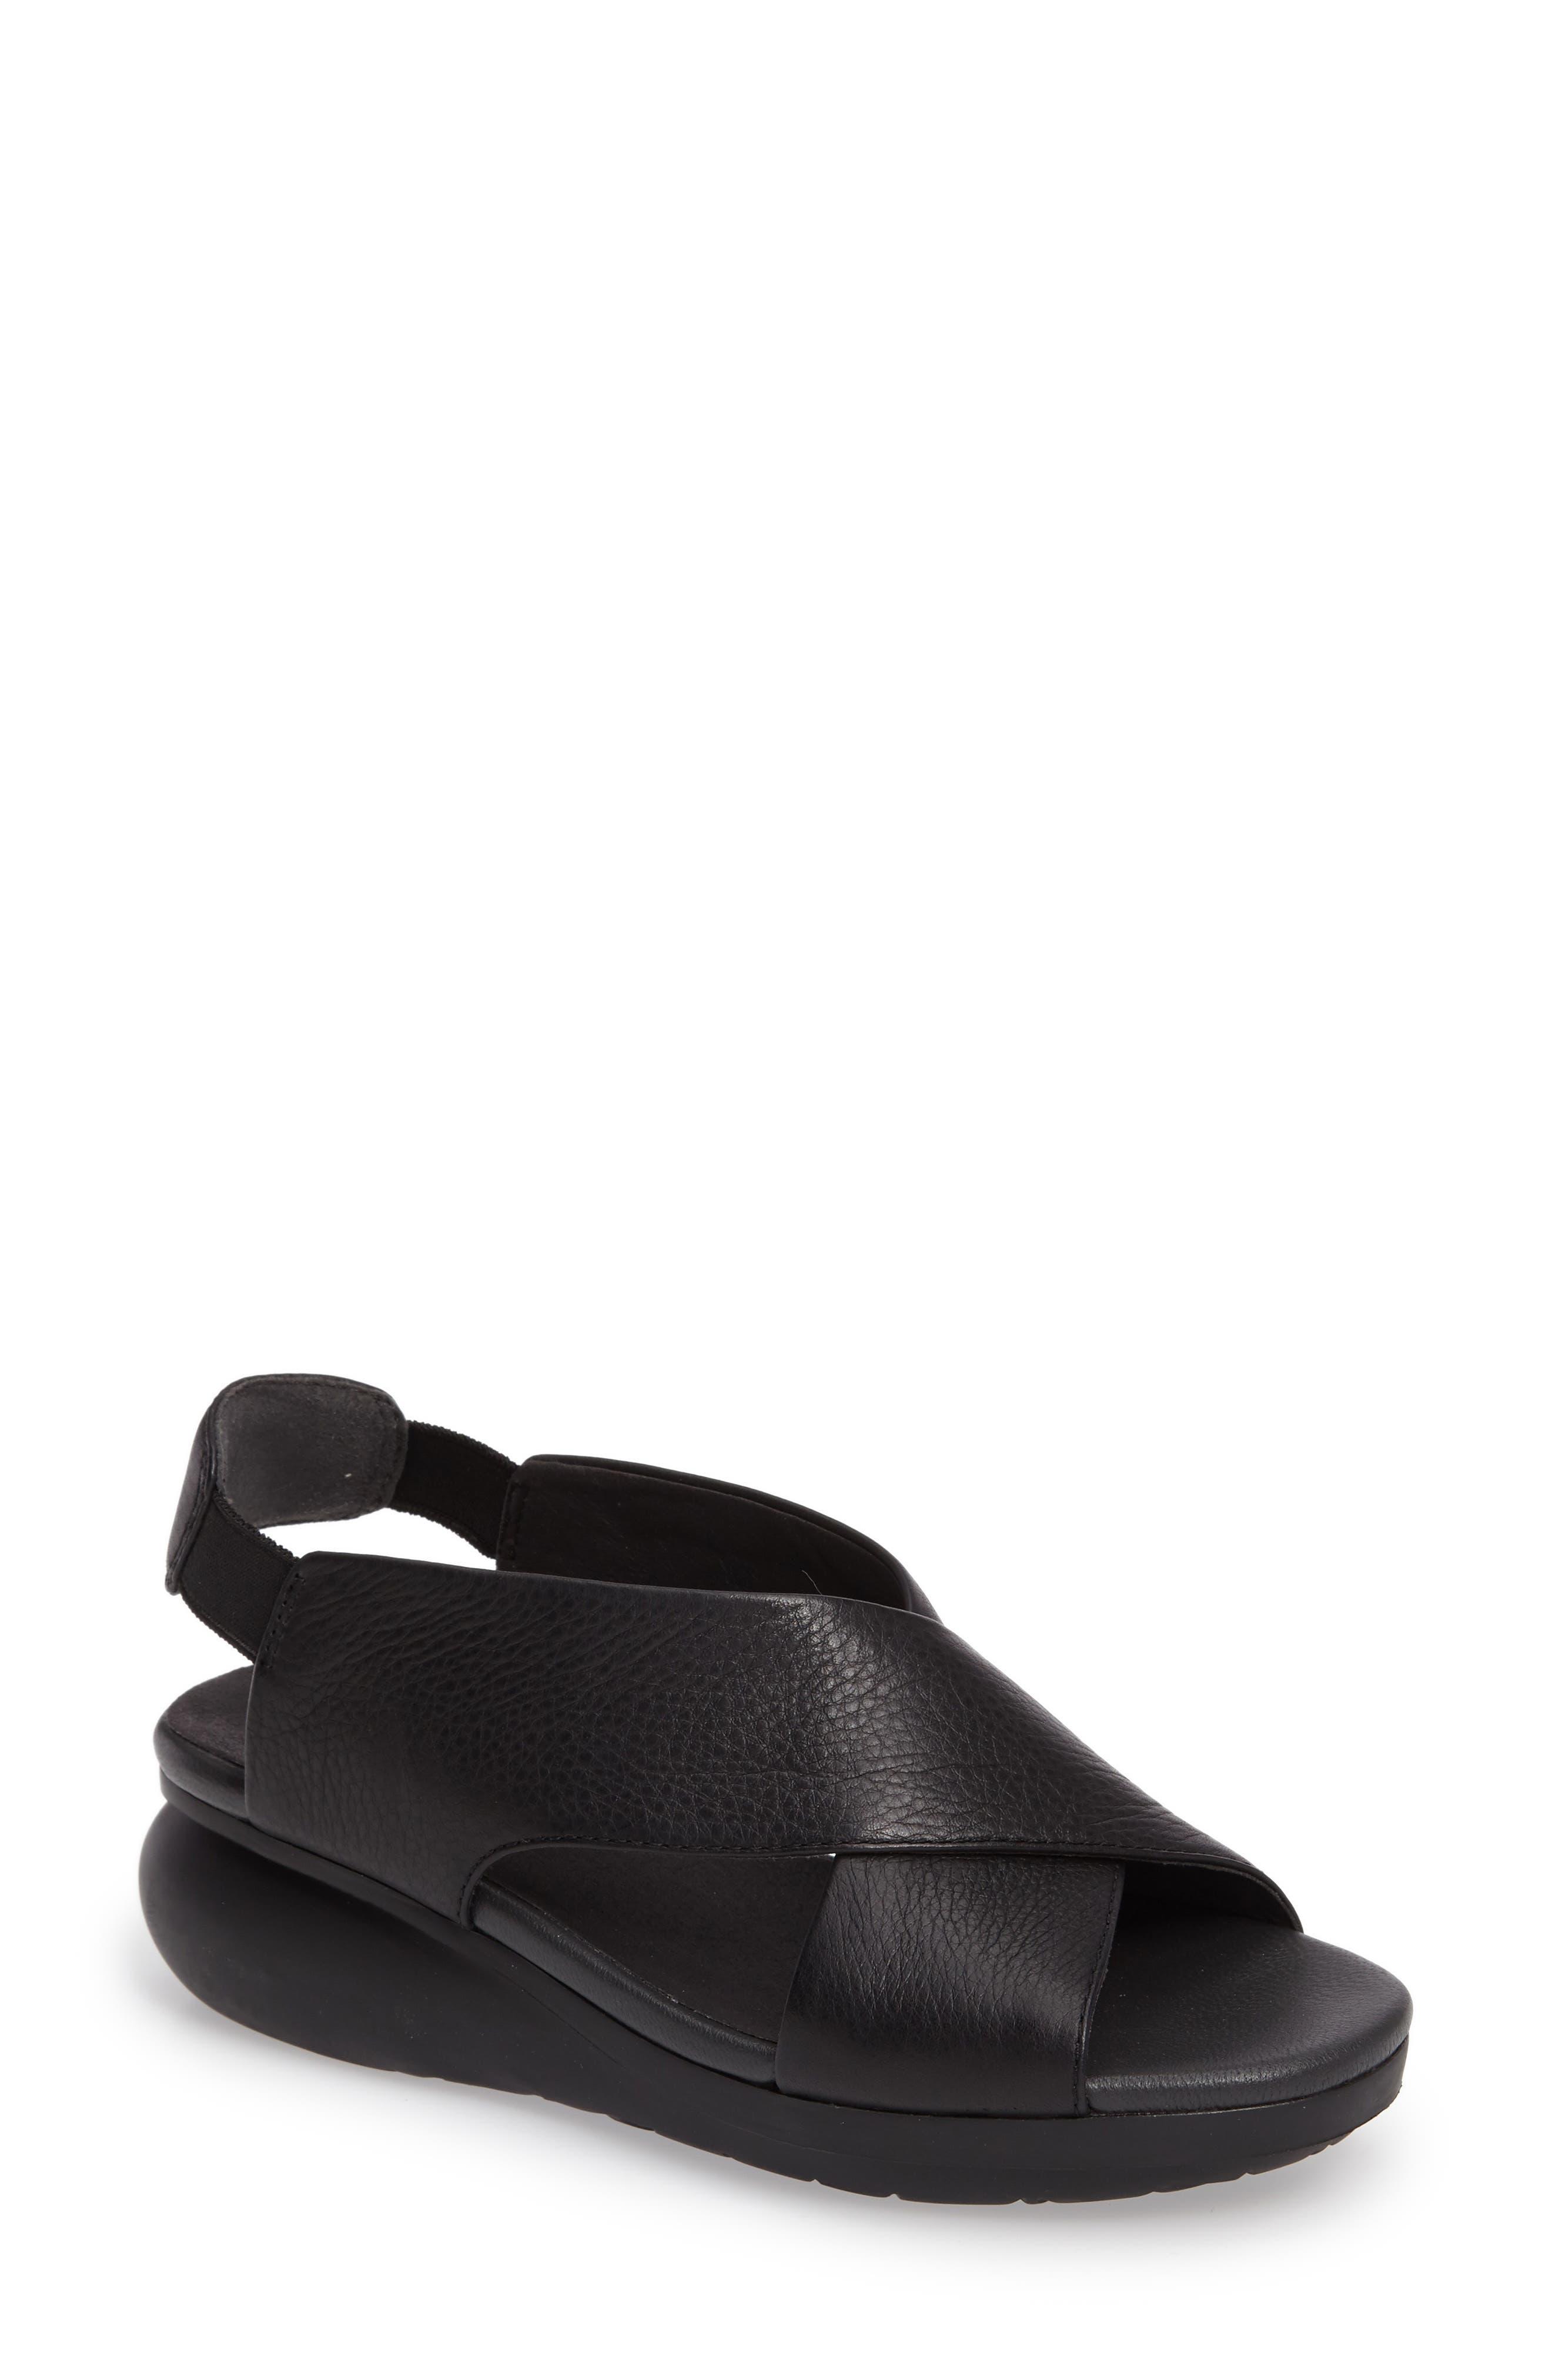 Balloon Slingback Wedge Sandal,                         Main,                         color, Black Leather